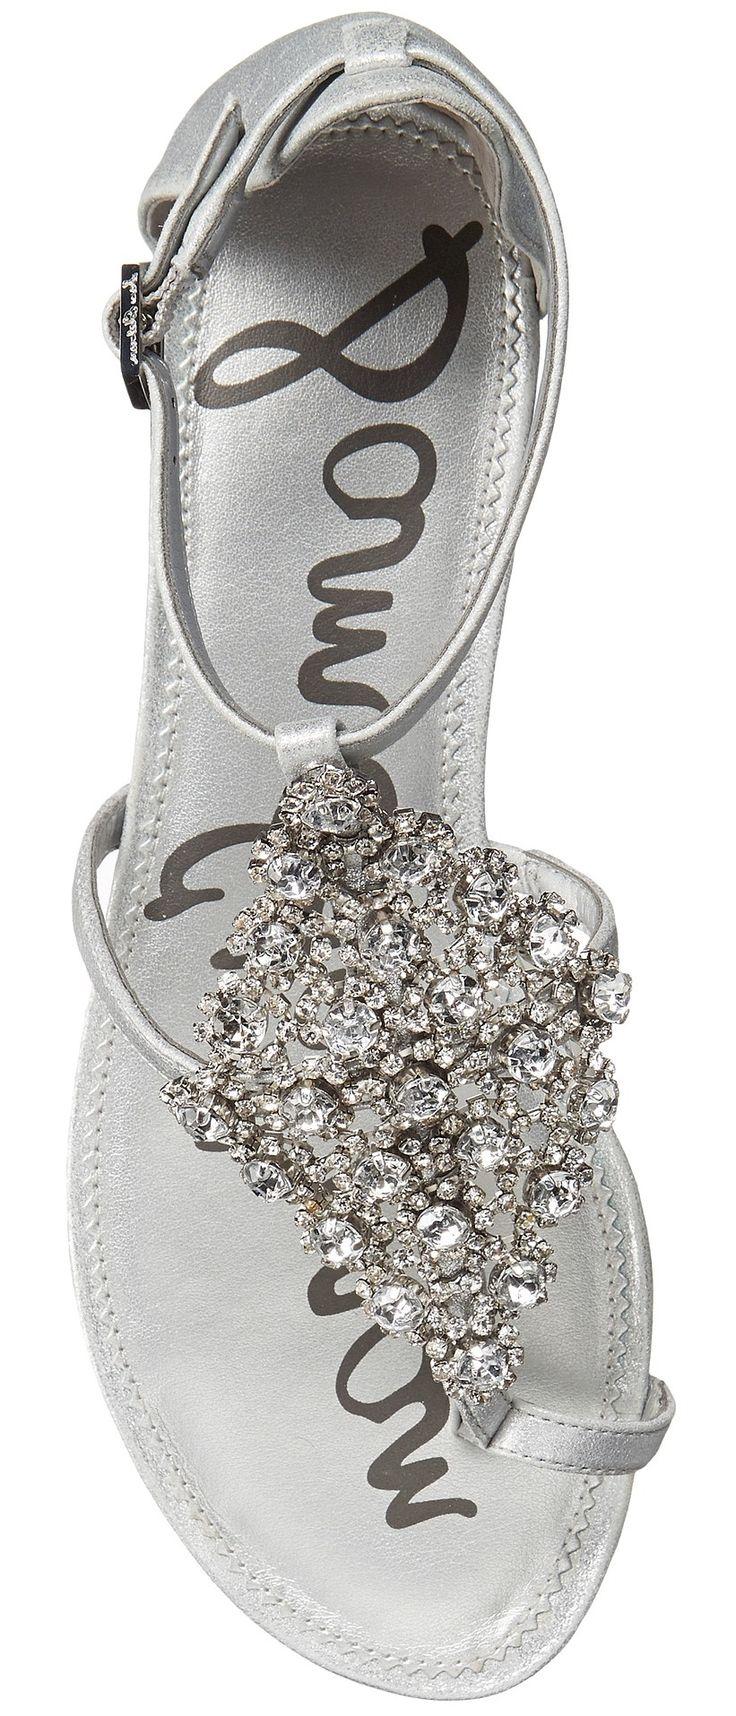 Sam Edelman Jeweled Sandals